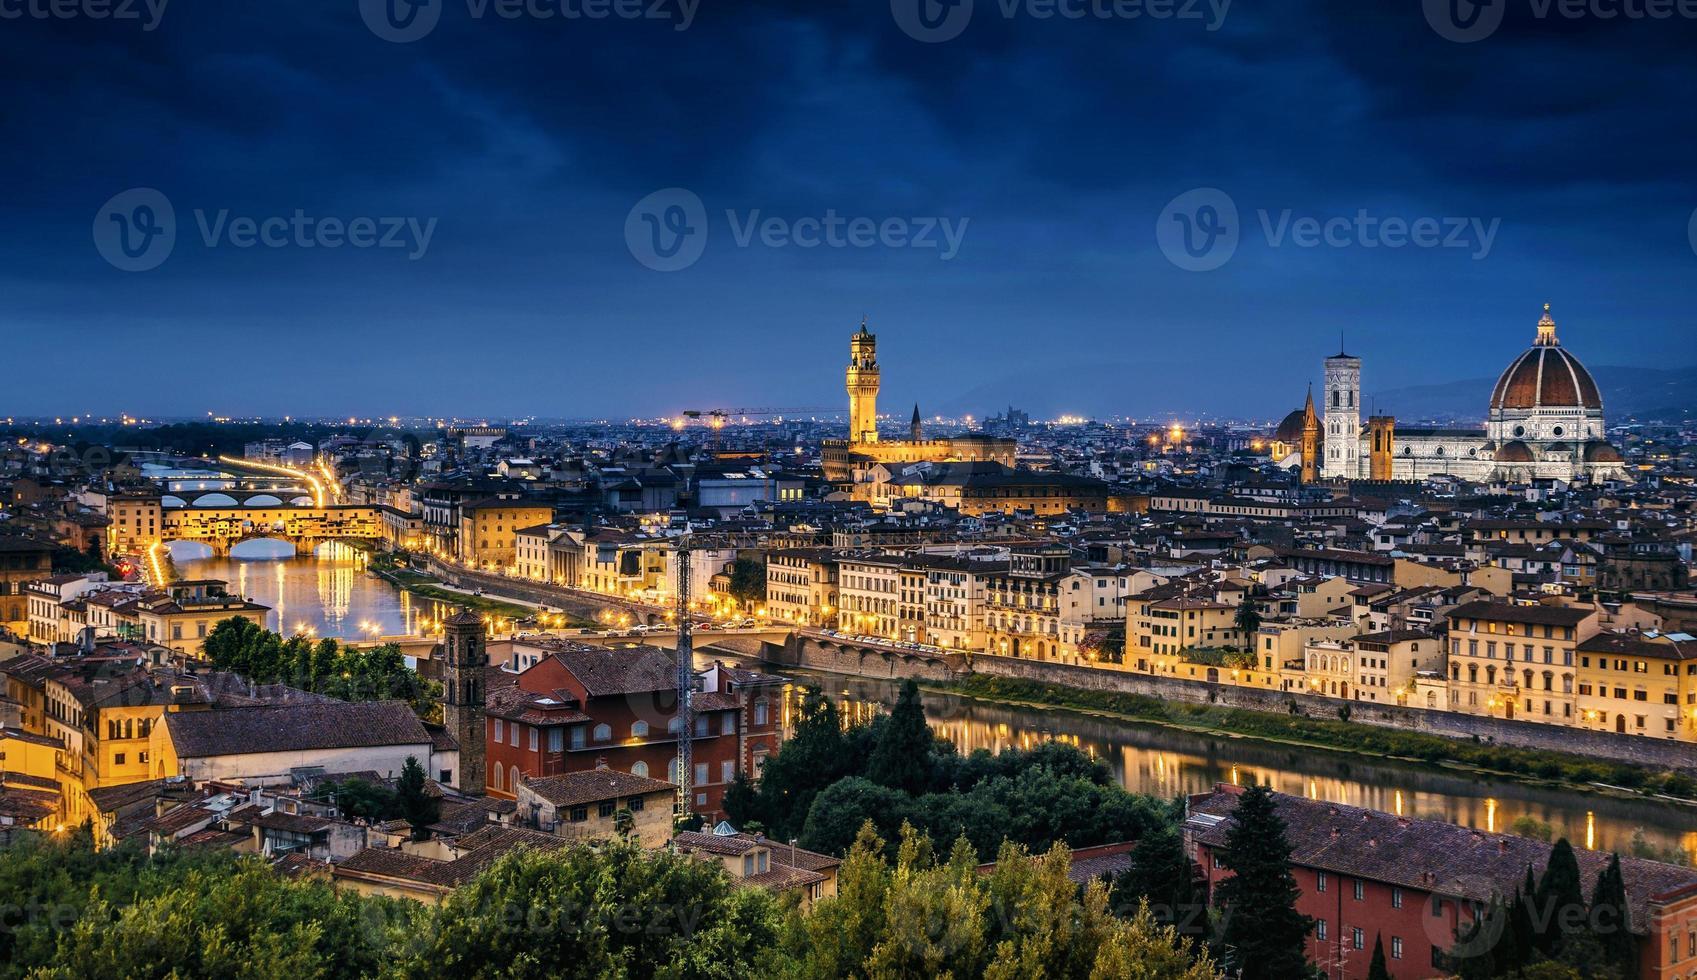 Florence skyline photo